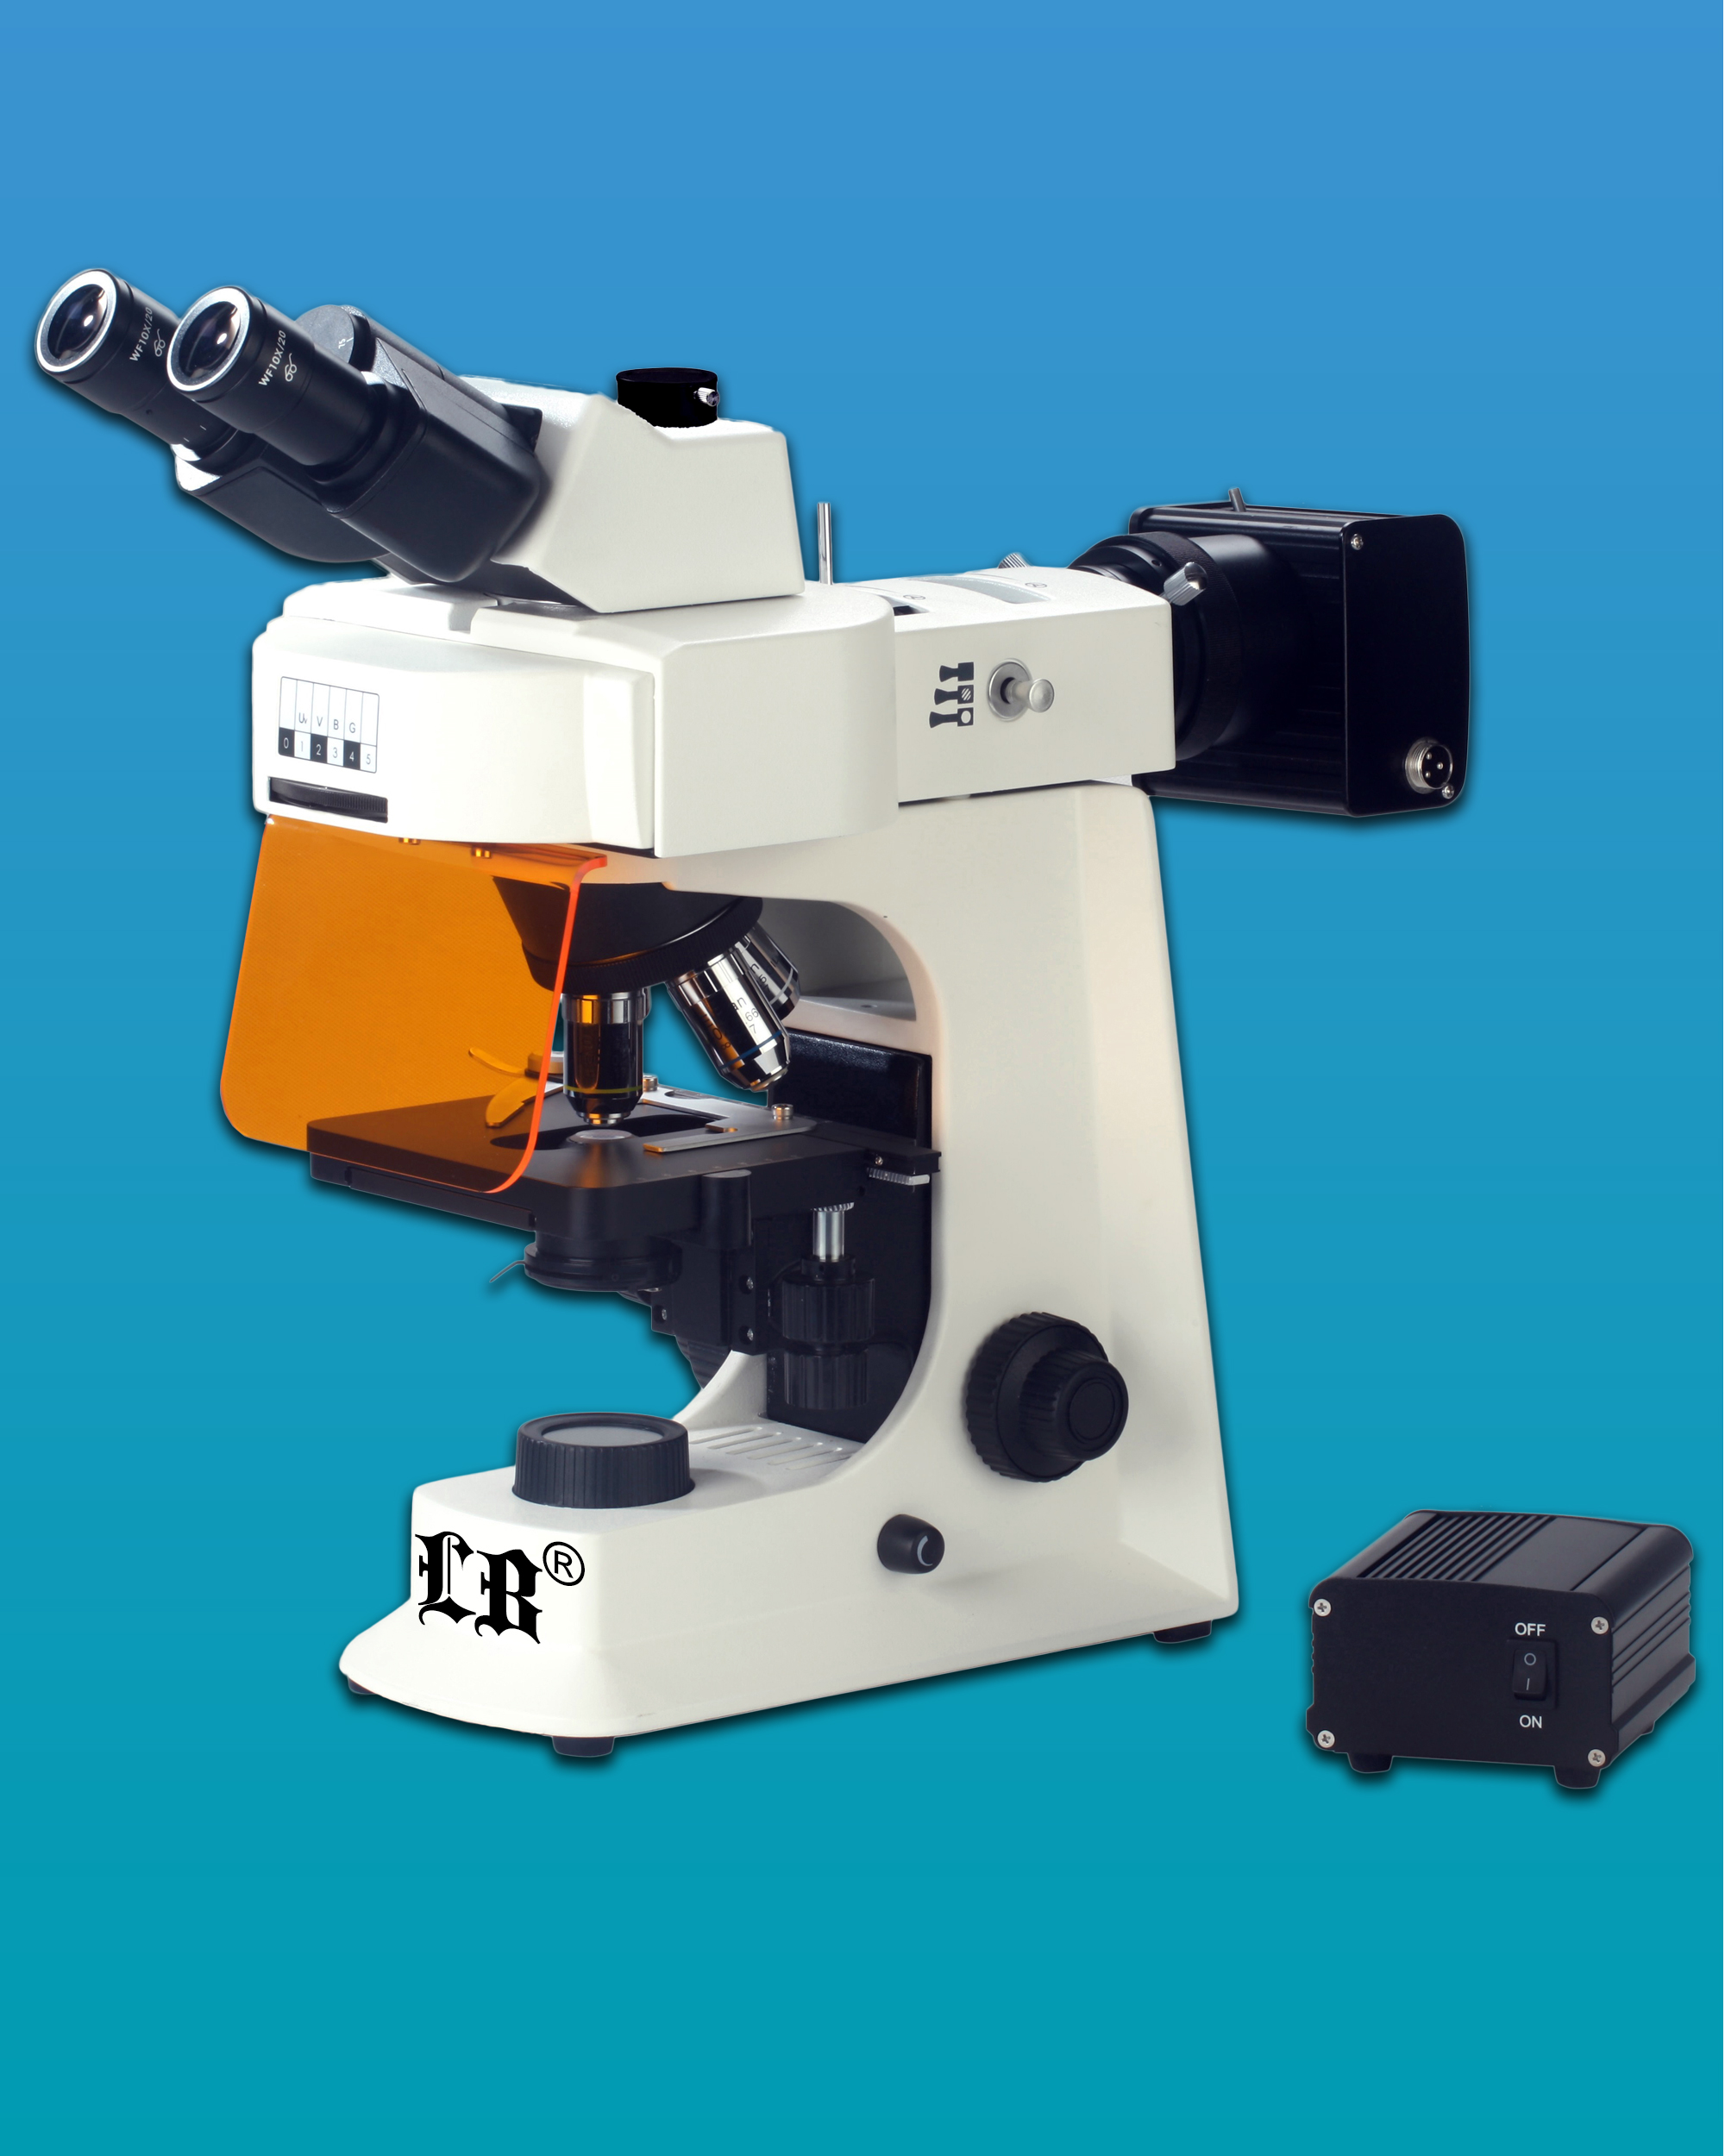 [LB-264] Biological Trinocular Flourescent Microscope w/ LED Illumination &  Infinite Optical System